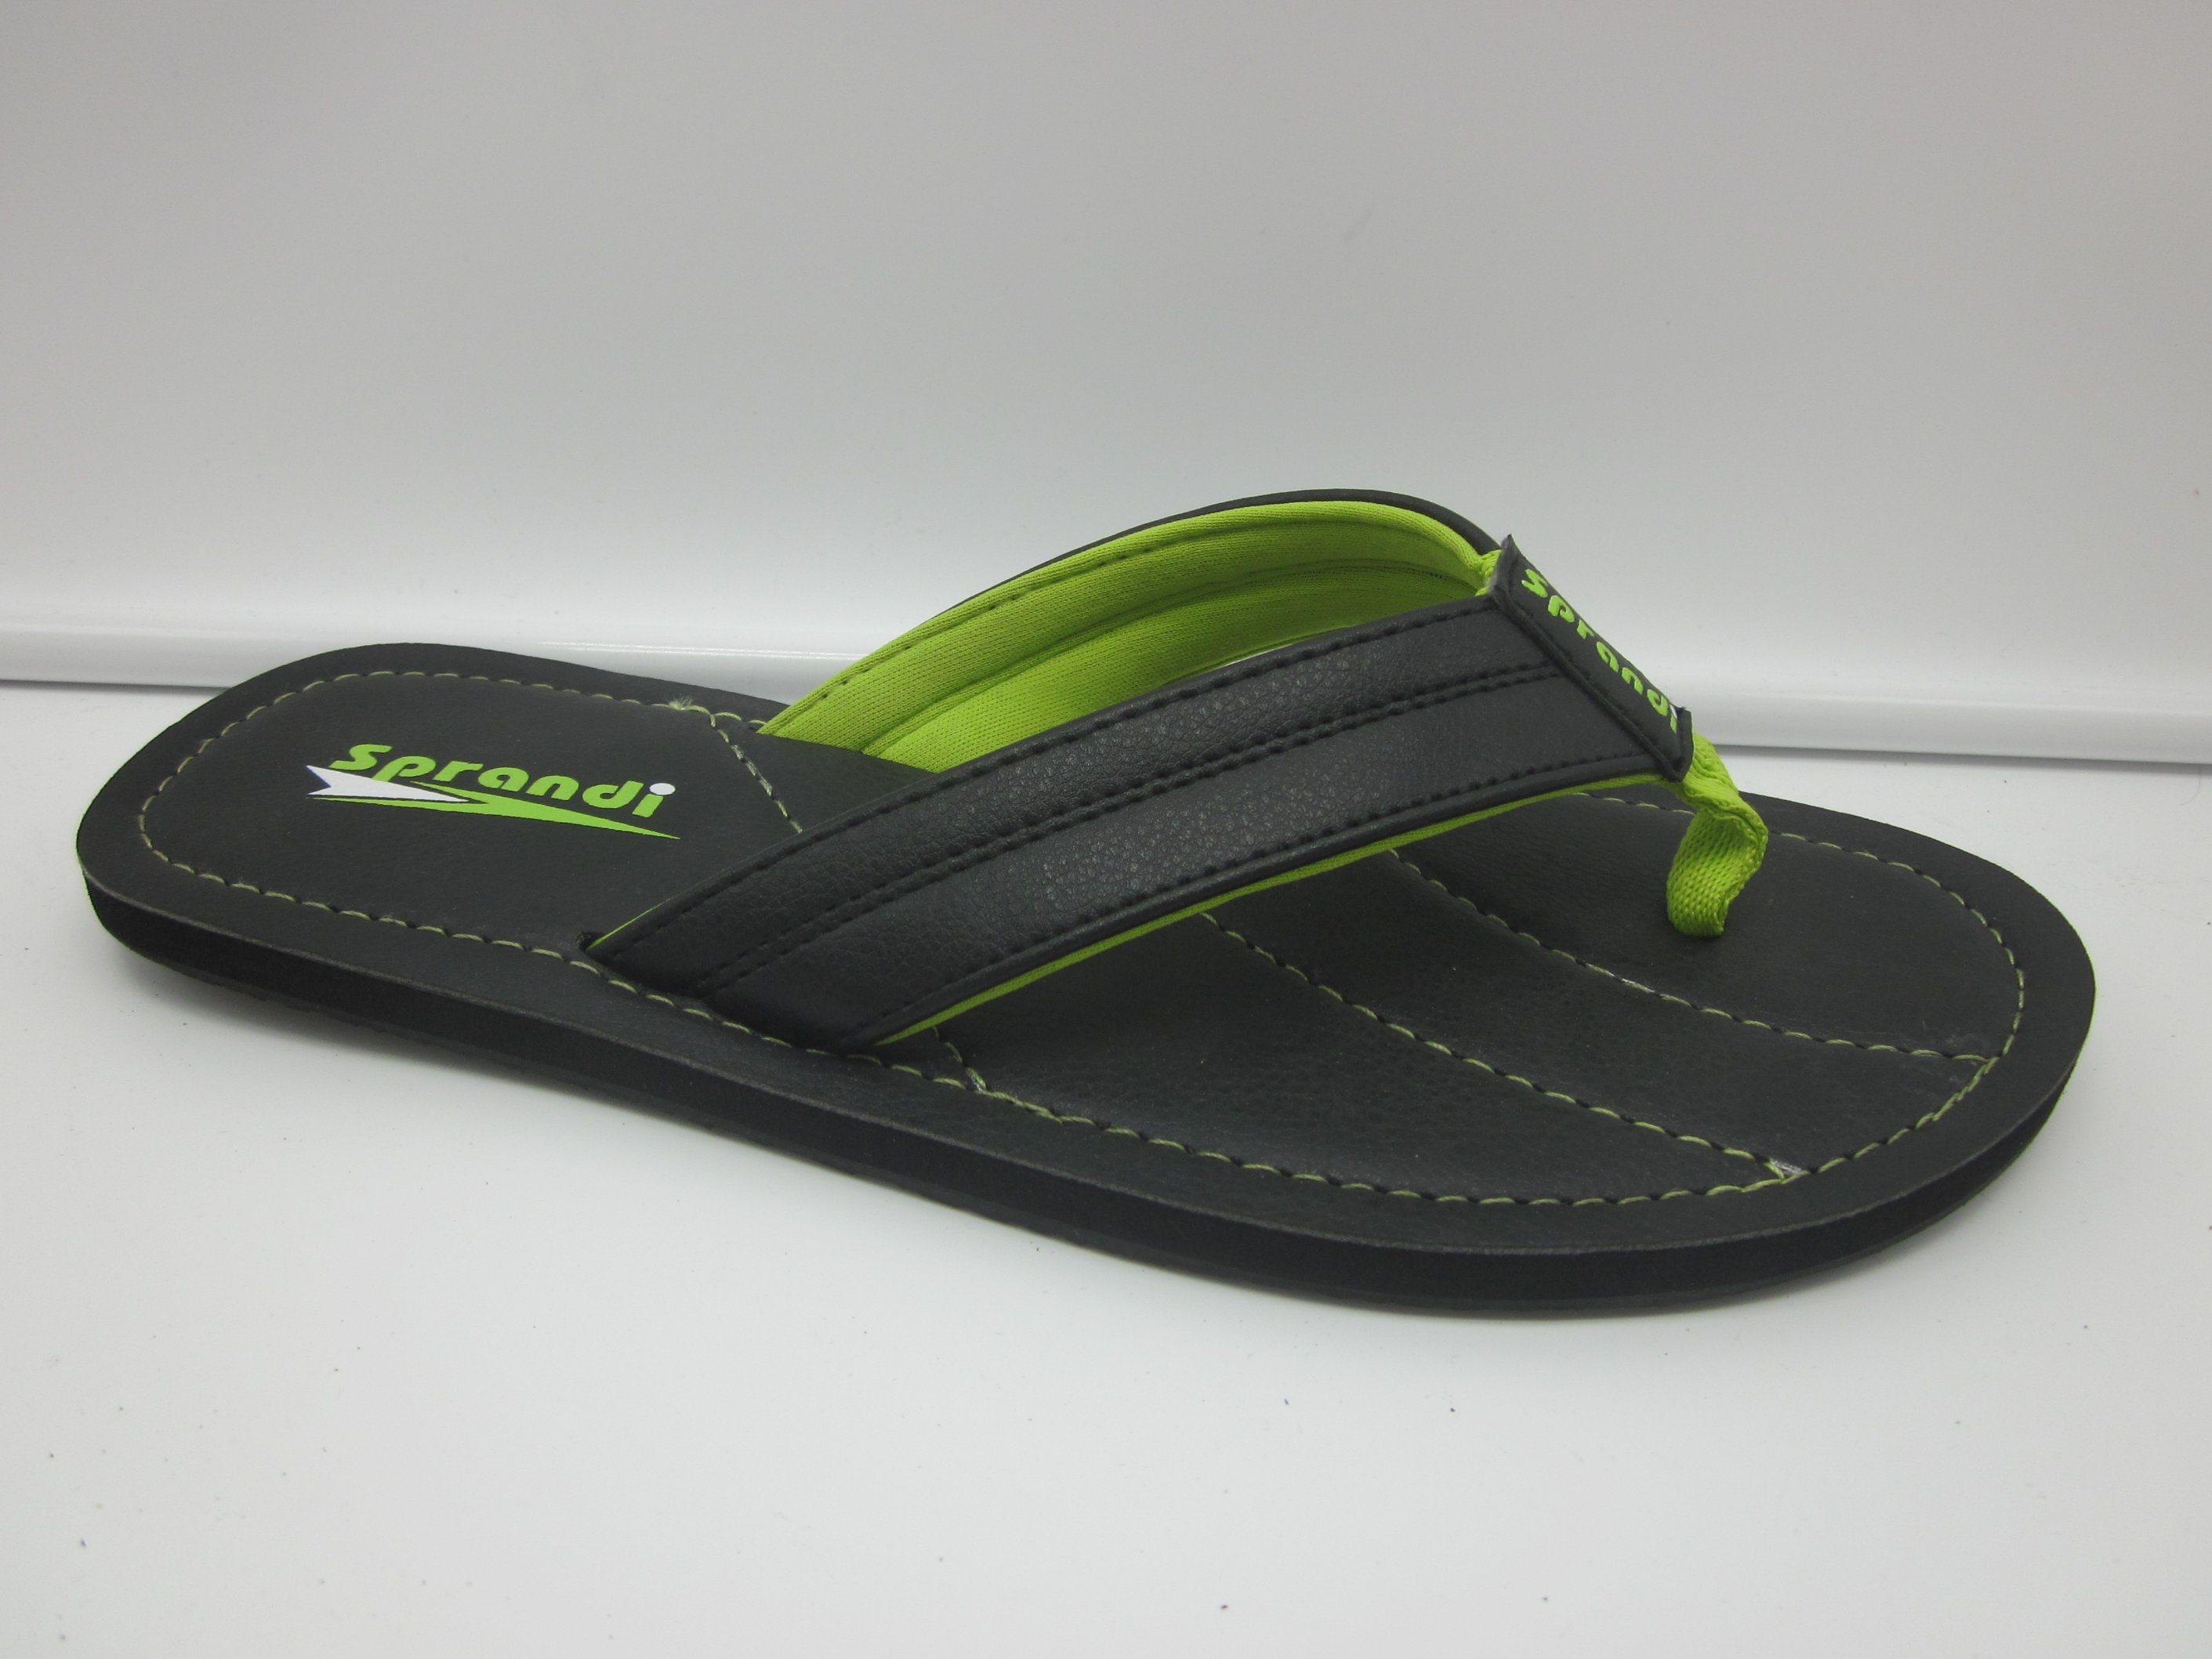 8d740adbb China Customize Design EVA Men′s Summer Flip Flops Beach Rubber ...